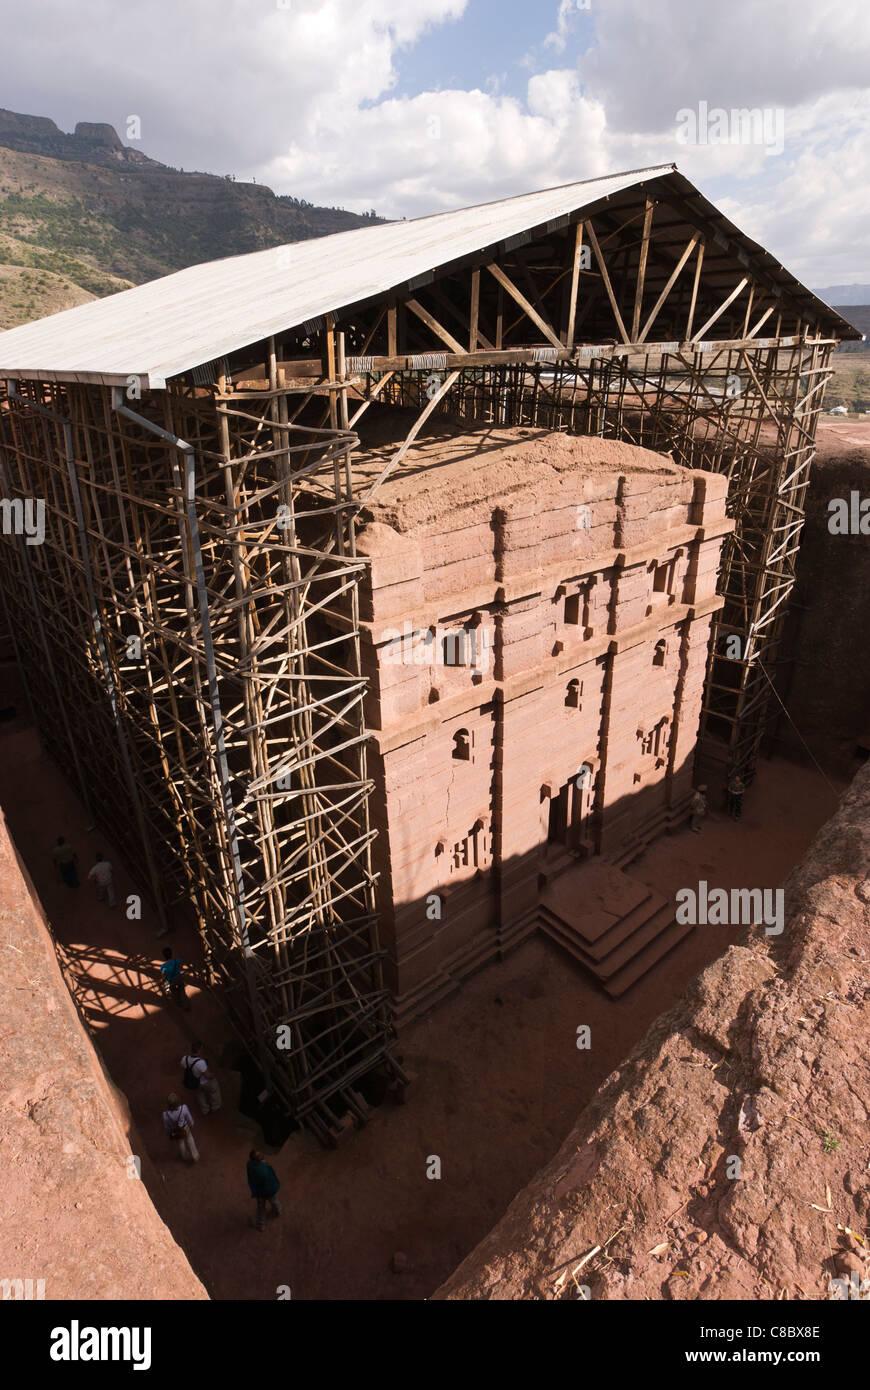 Elk200-3234v Ethiopia, Lalibela, rock cut church, 12th-13th c, Bet Amanuel - Stock Image